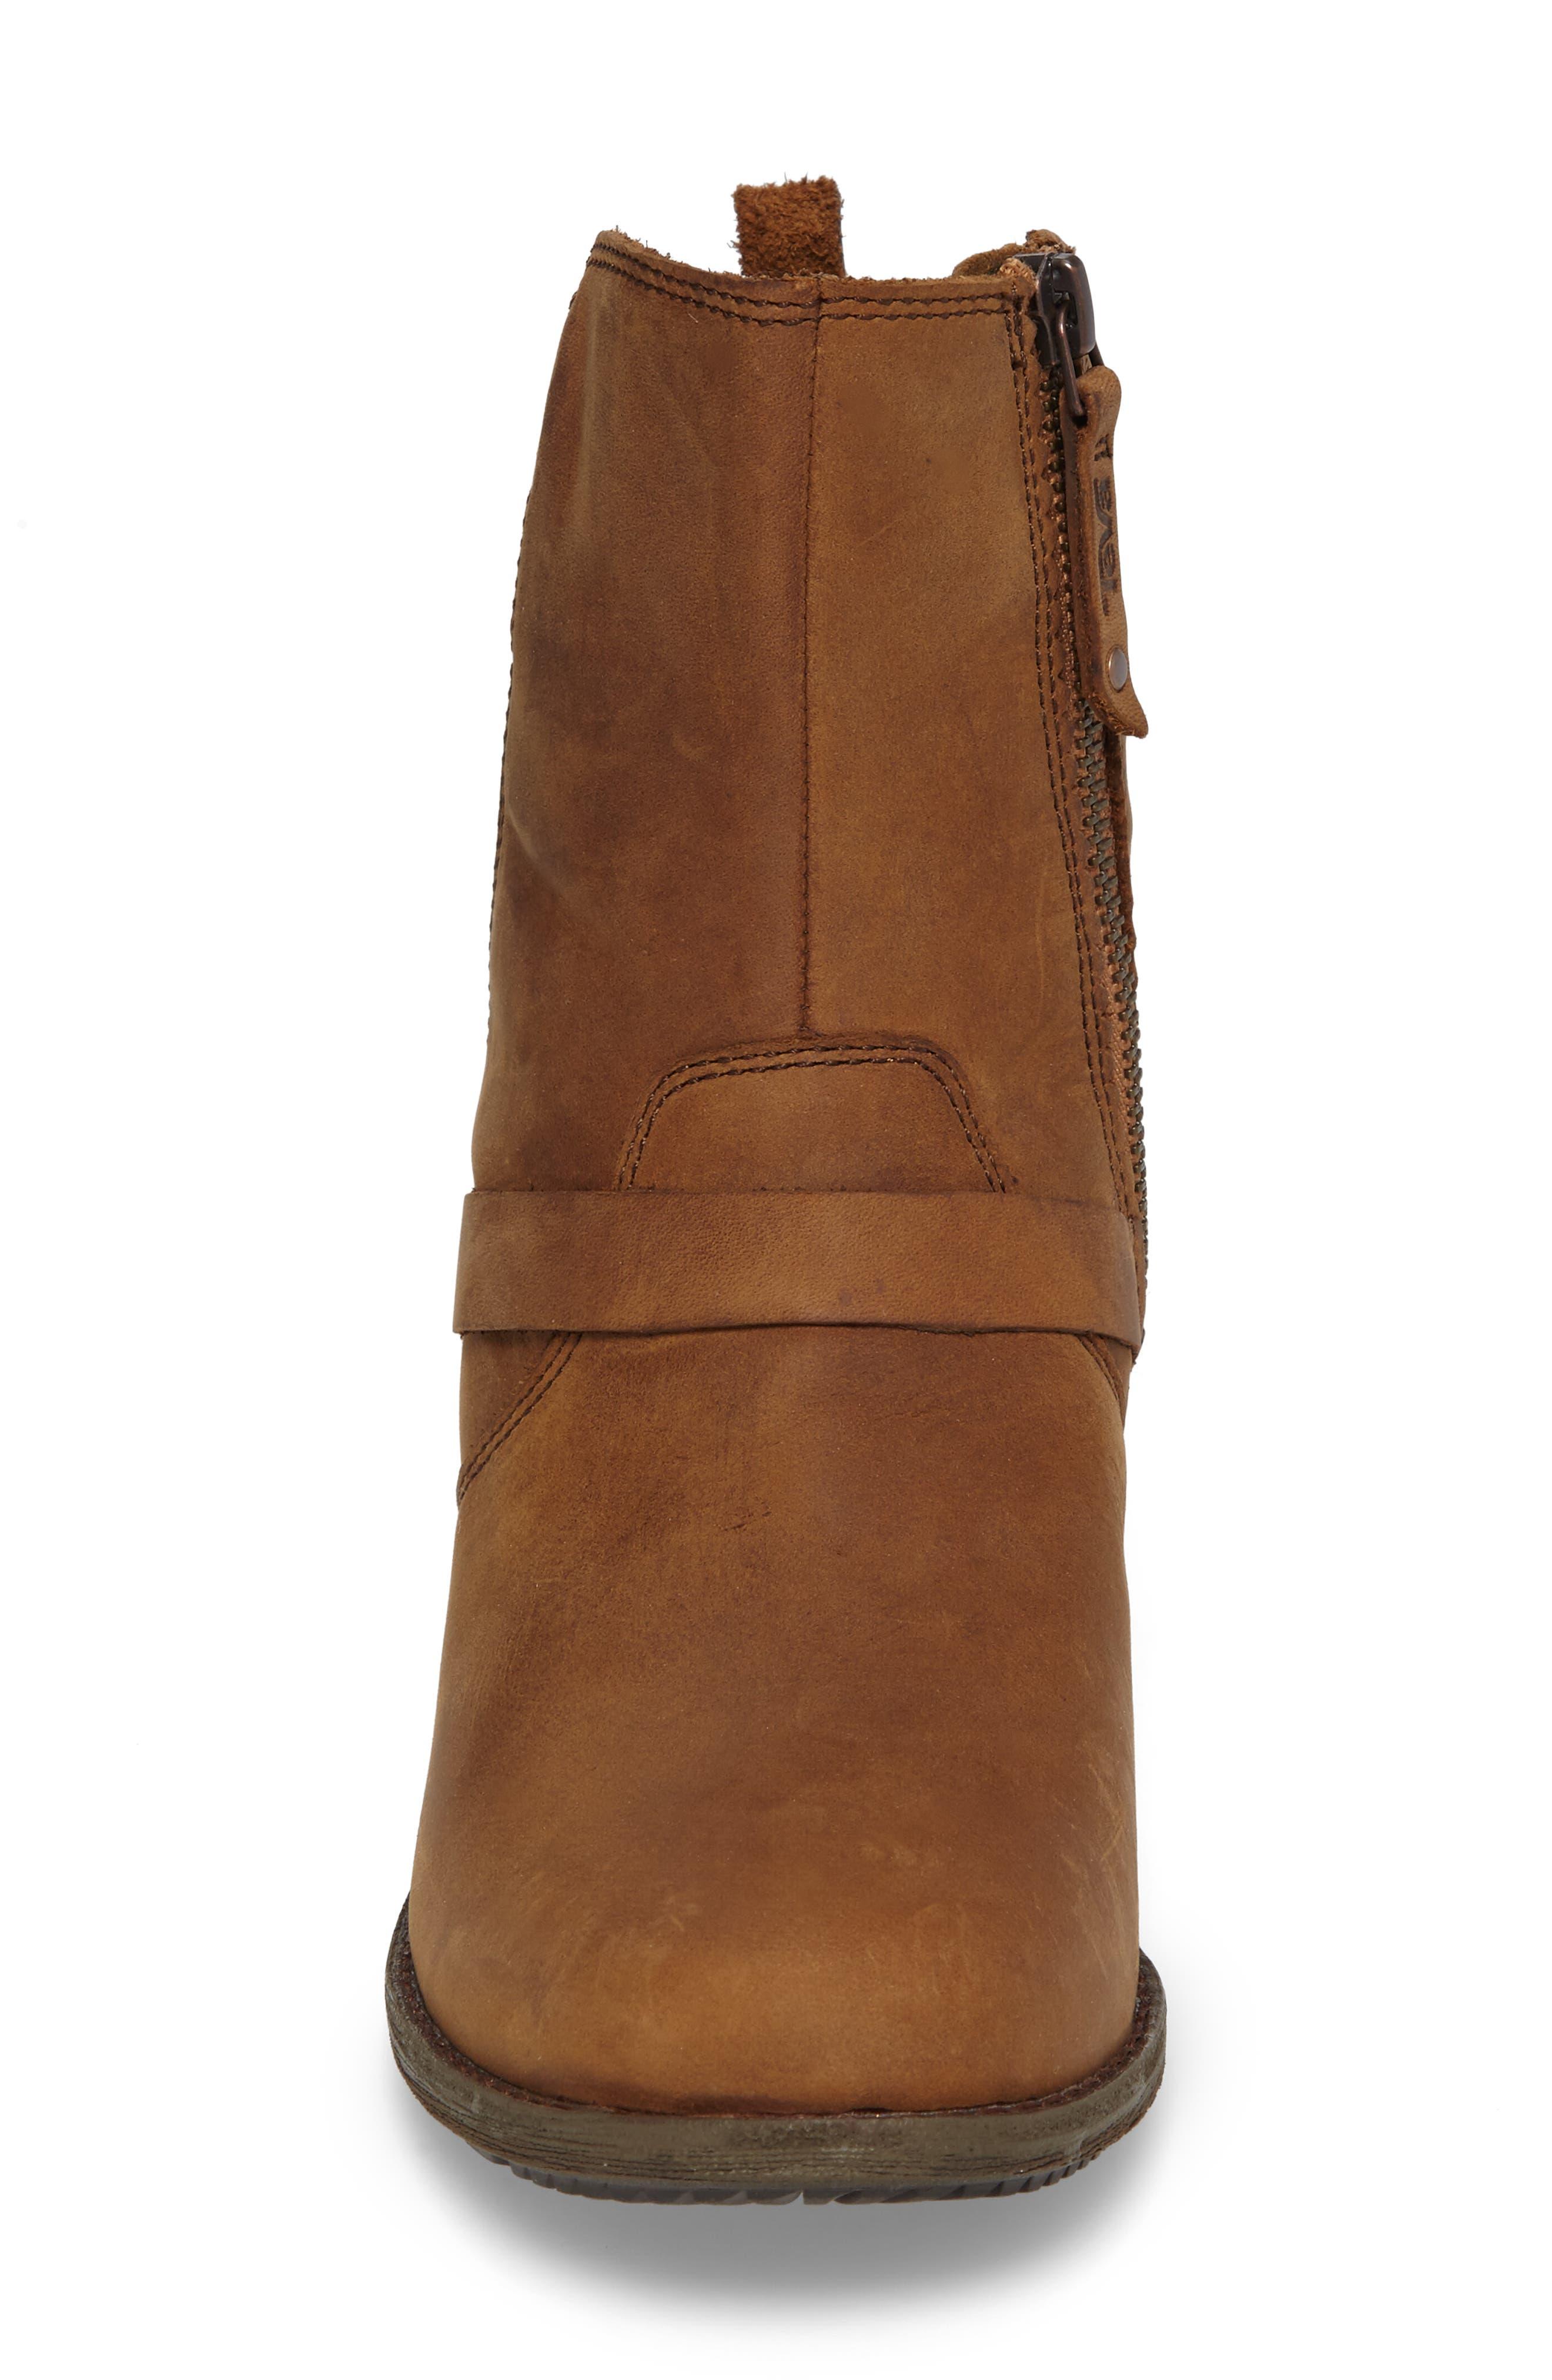 Dina La Vina Dos Waterproof Boot,                             Alternate thumbnail 4, color,                             Bison Leather